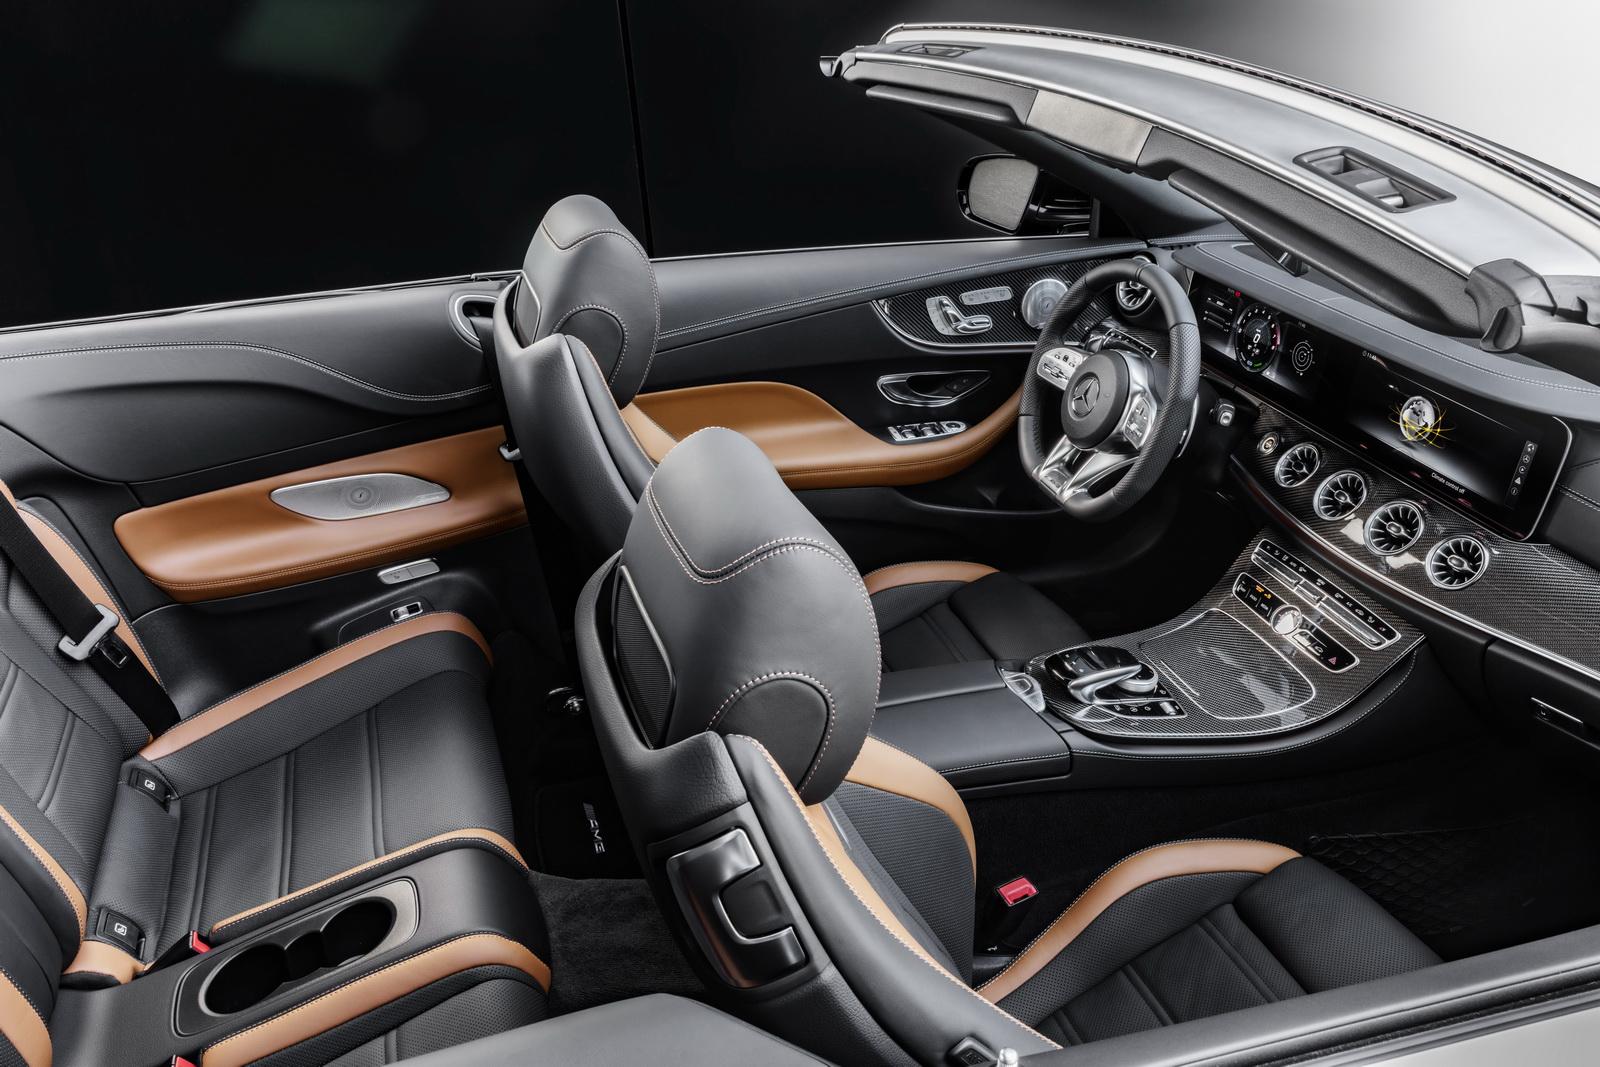 Mercedes-AMG E 53 4MATIC+ CabrioletExterieur: Obsidianschwarz metallicInterieur: Polsterung Leder Nappa Schwarz/Sattelbraun //Exterior: Obsidian black metallicInterior: Upholstery nappa leather black/saddle brown (Kraftstoffverbrauch kombiniert: 8,5 l/100 km; CO2-Emissionen kombiniert: 201 g/km)(fuel consumption combined: 8.5 l/100 km; CO2 emissions combined: 201 g/km)